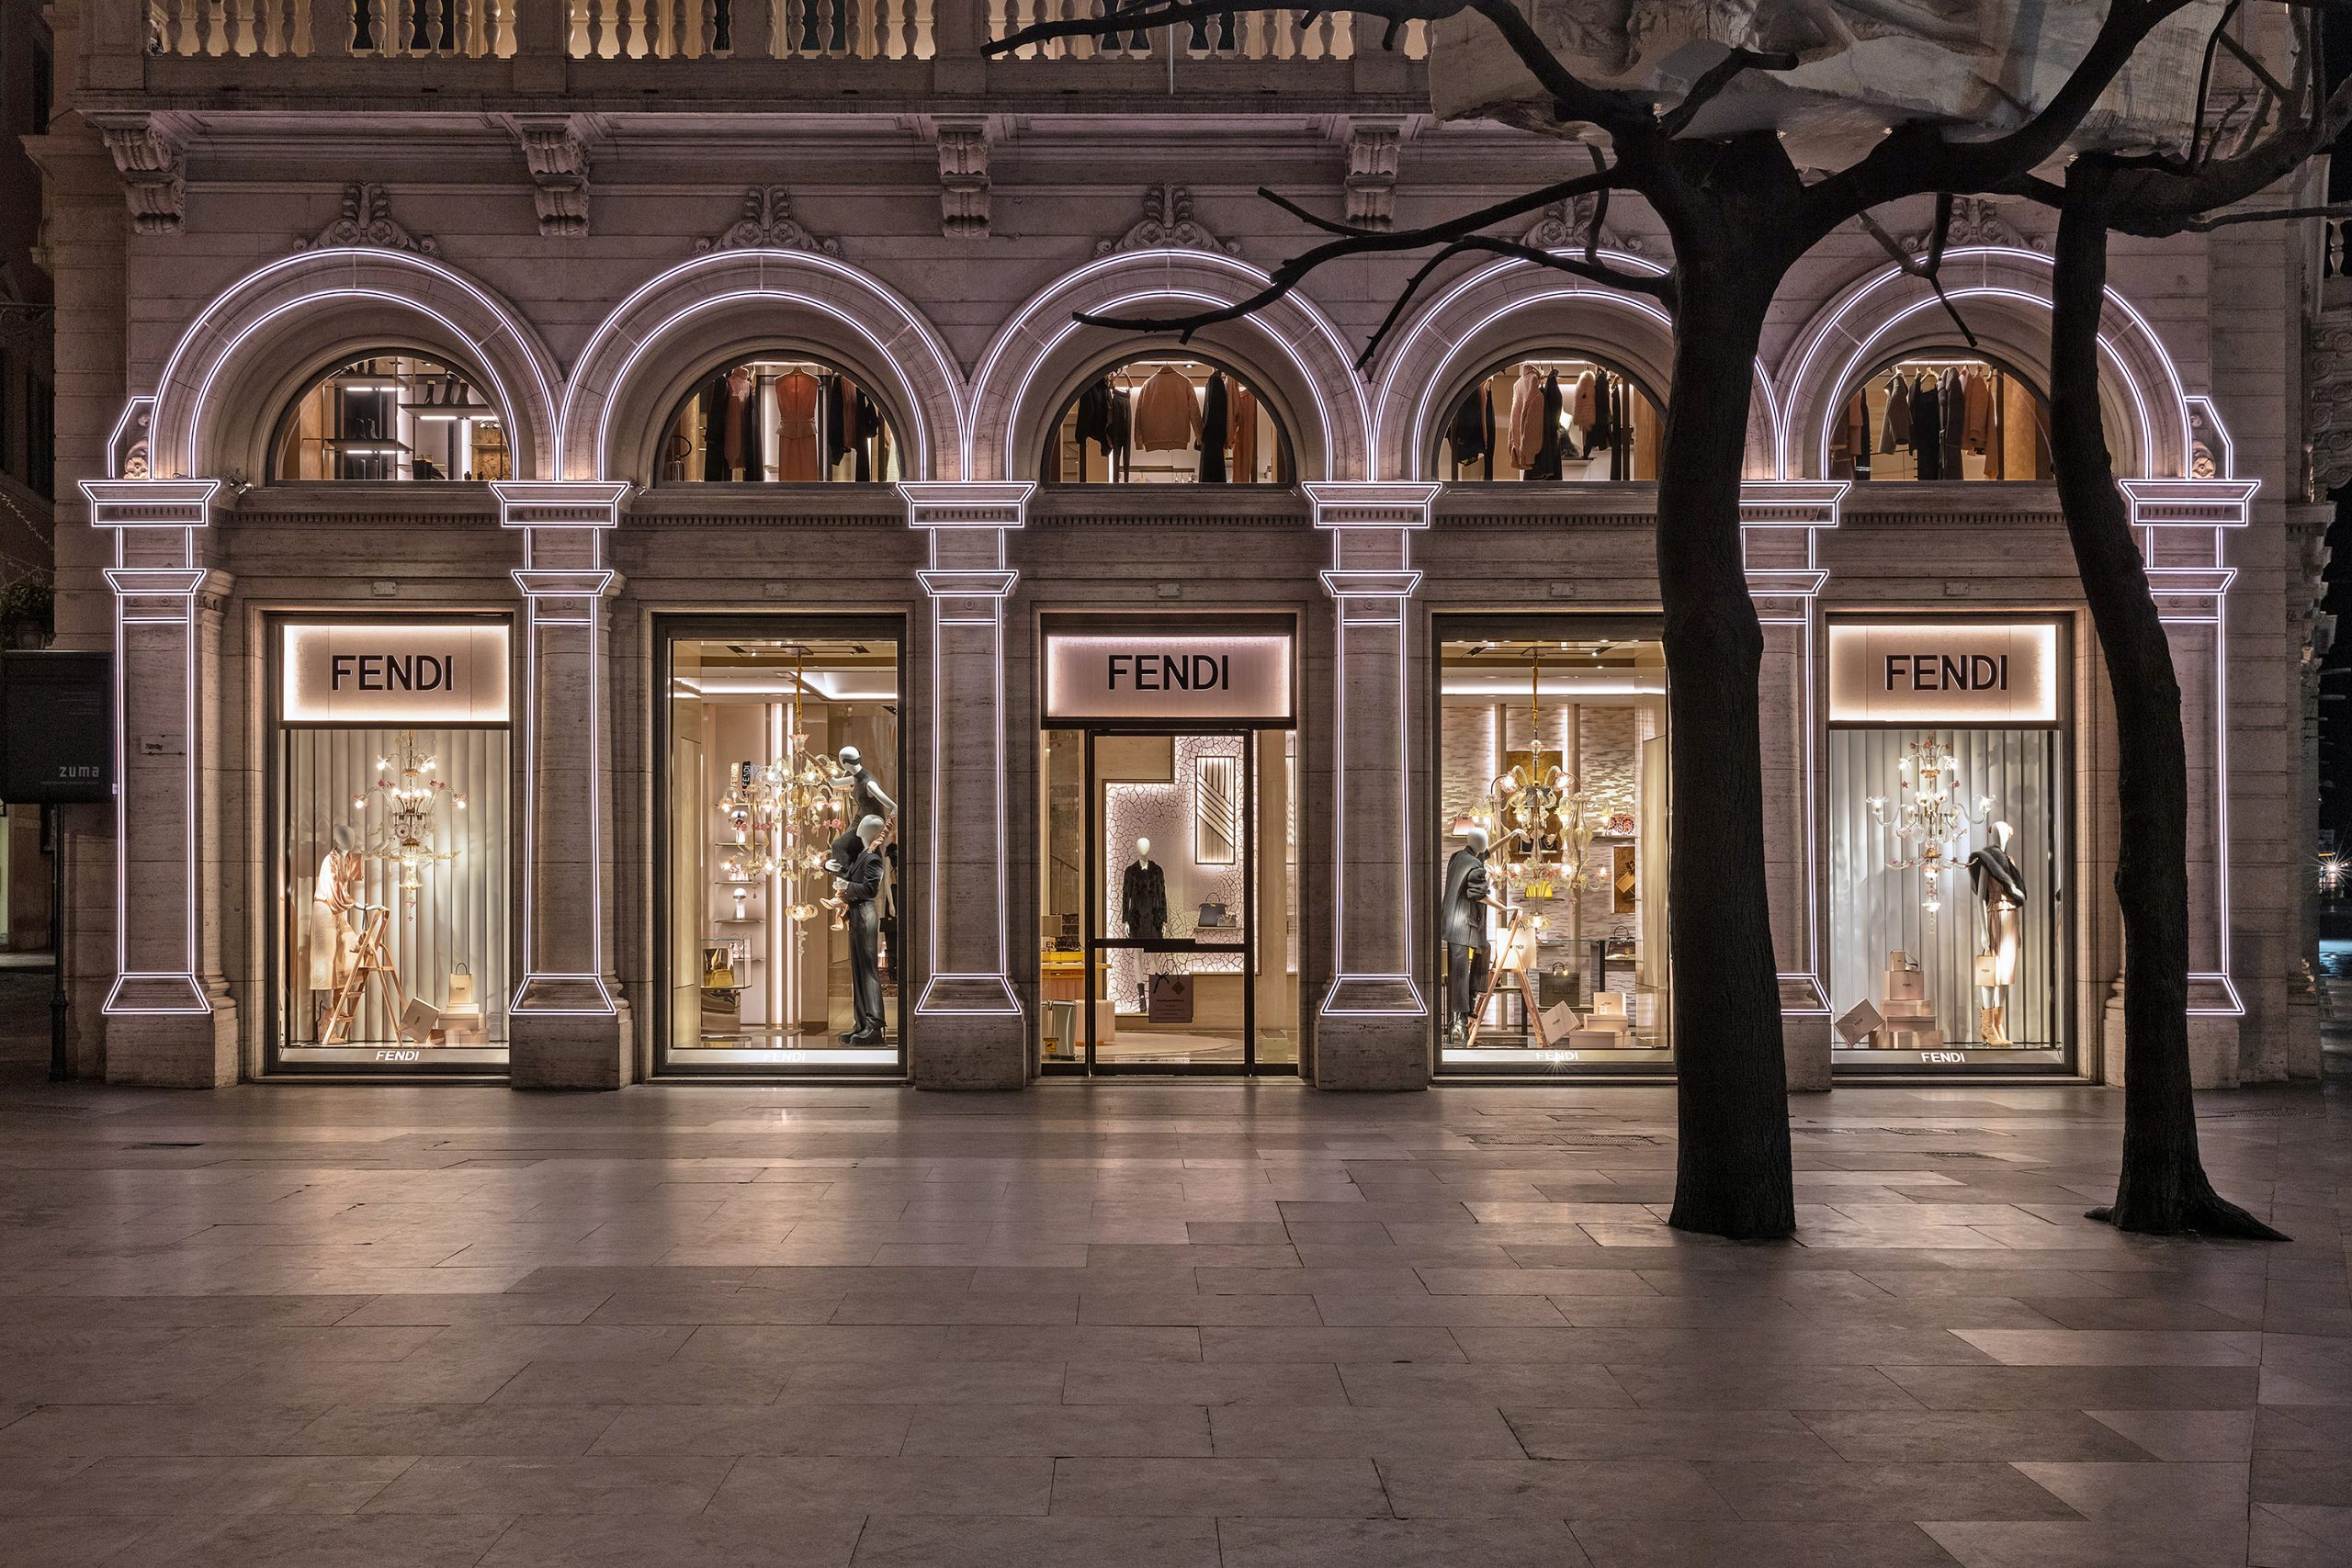 Fendi Displays Their Annual Roman Holiday Decorations